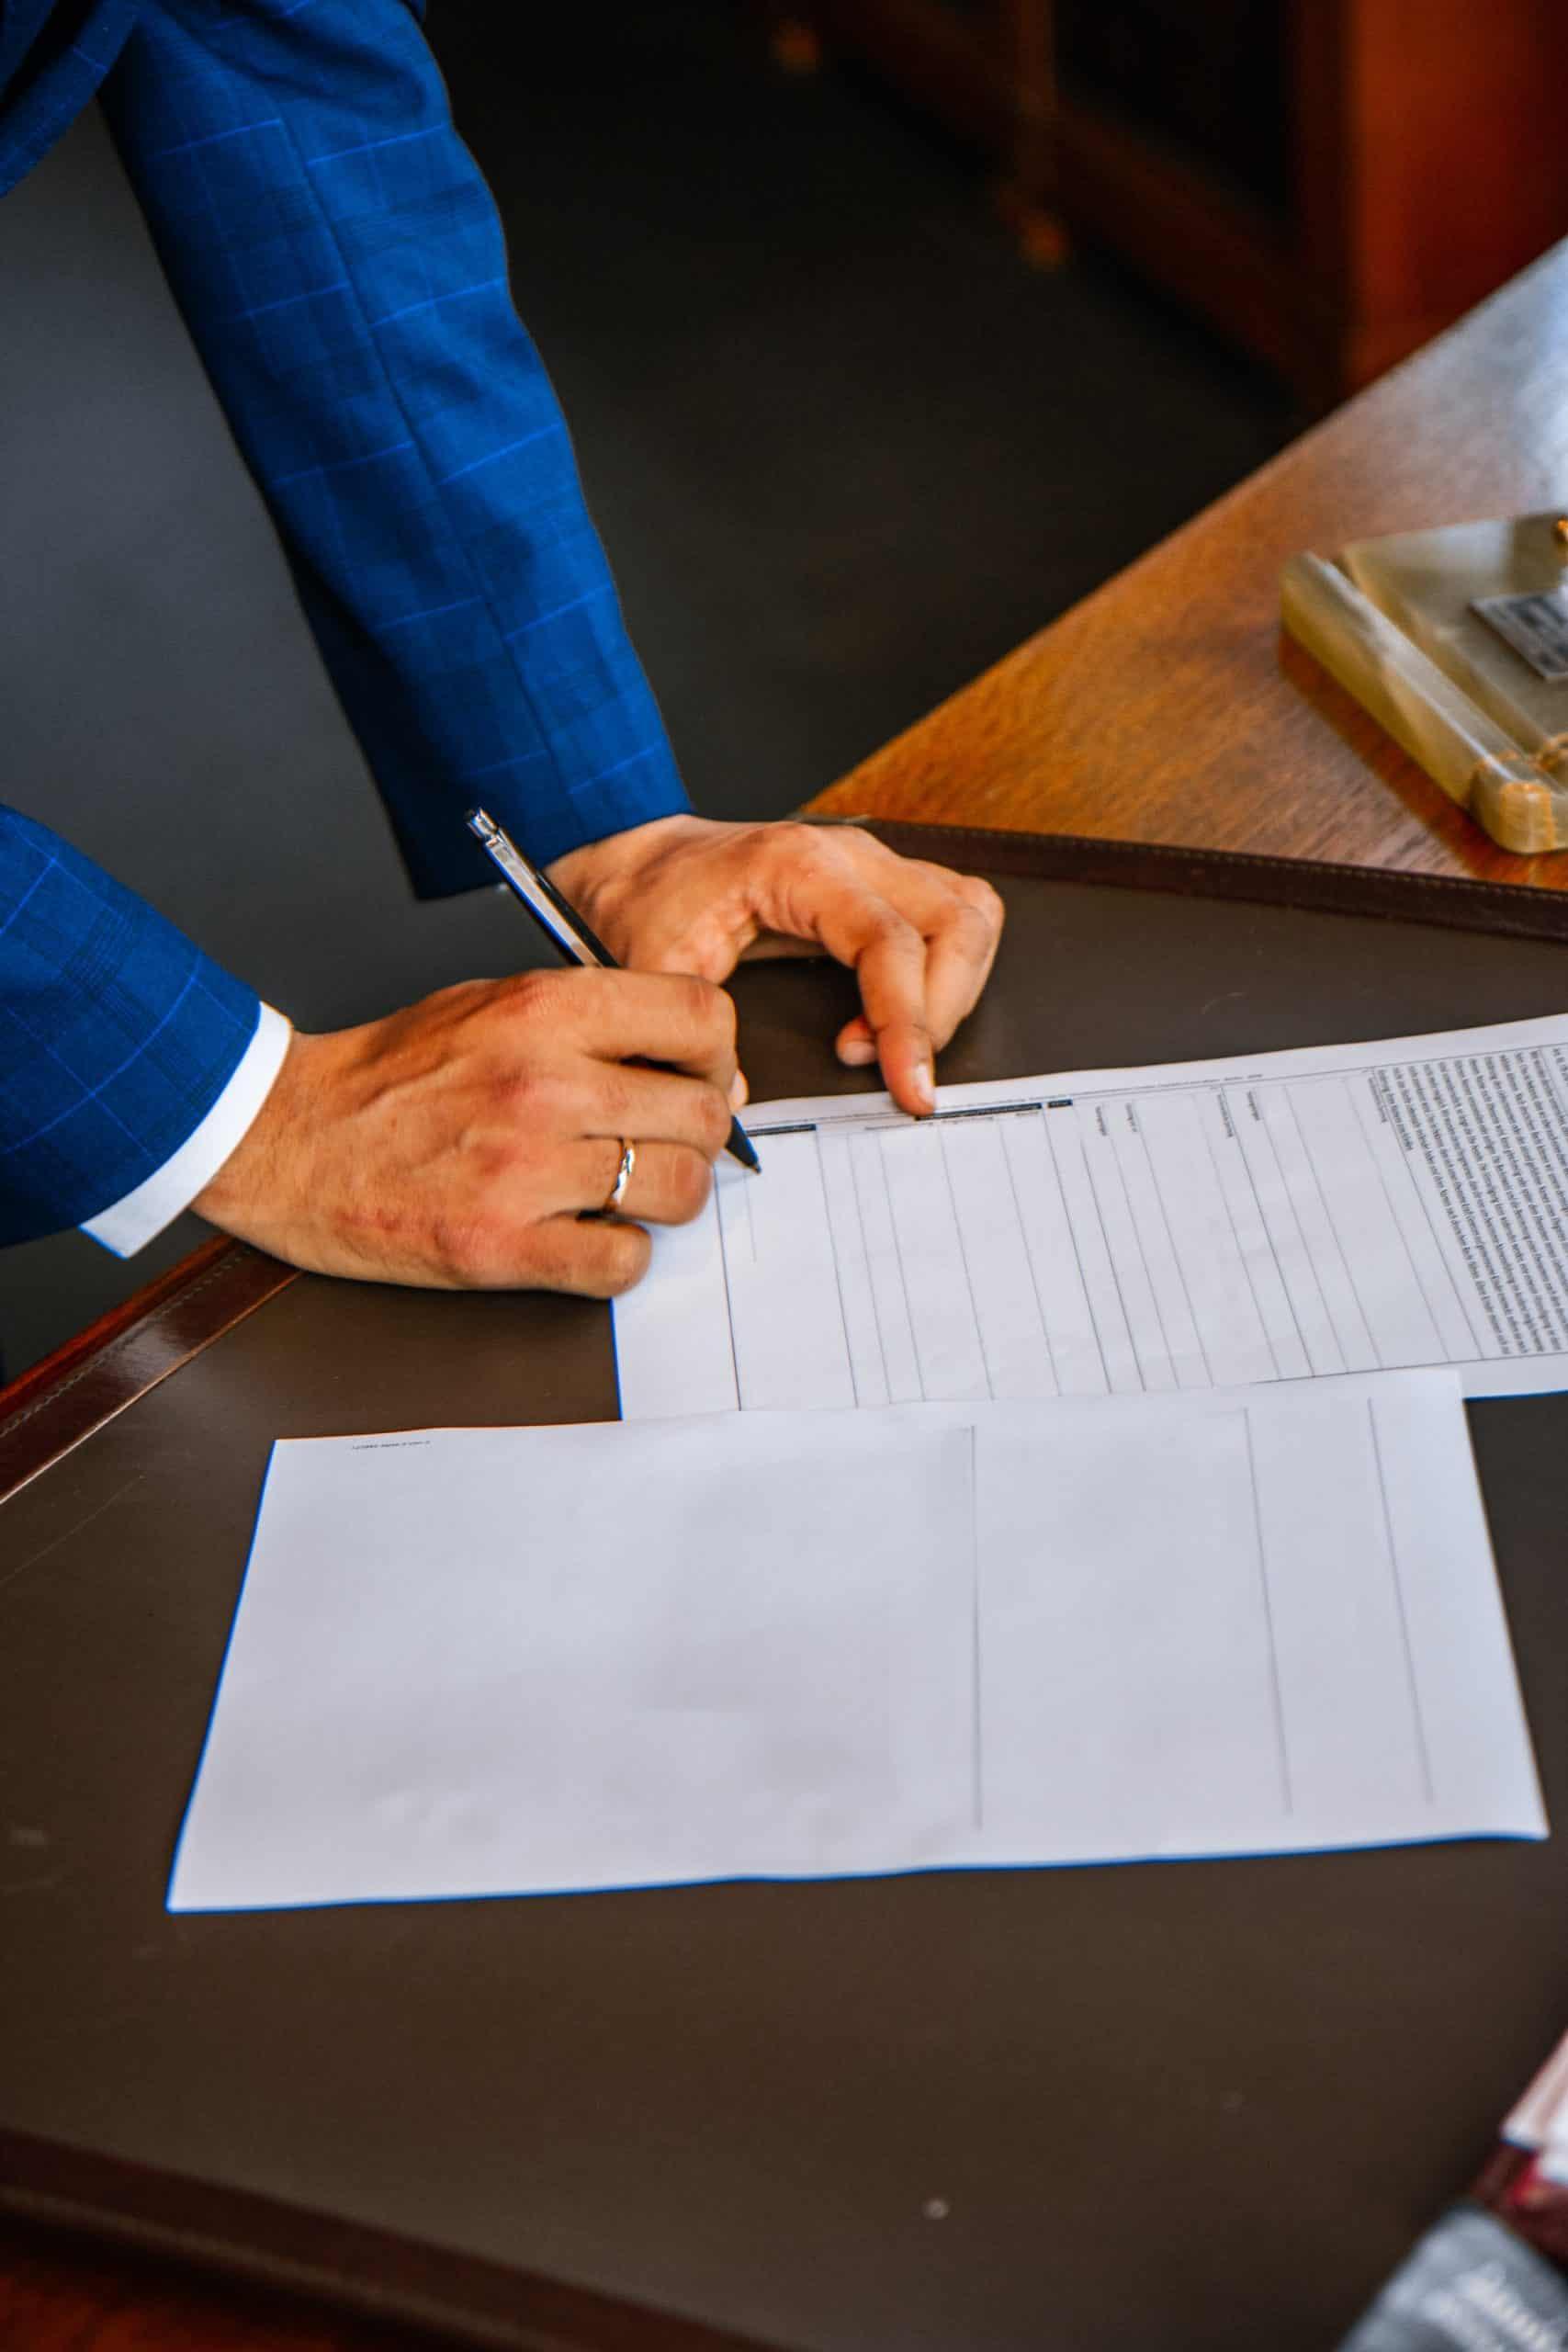 Applying Loan Guide Article Image